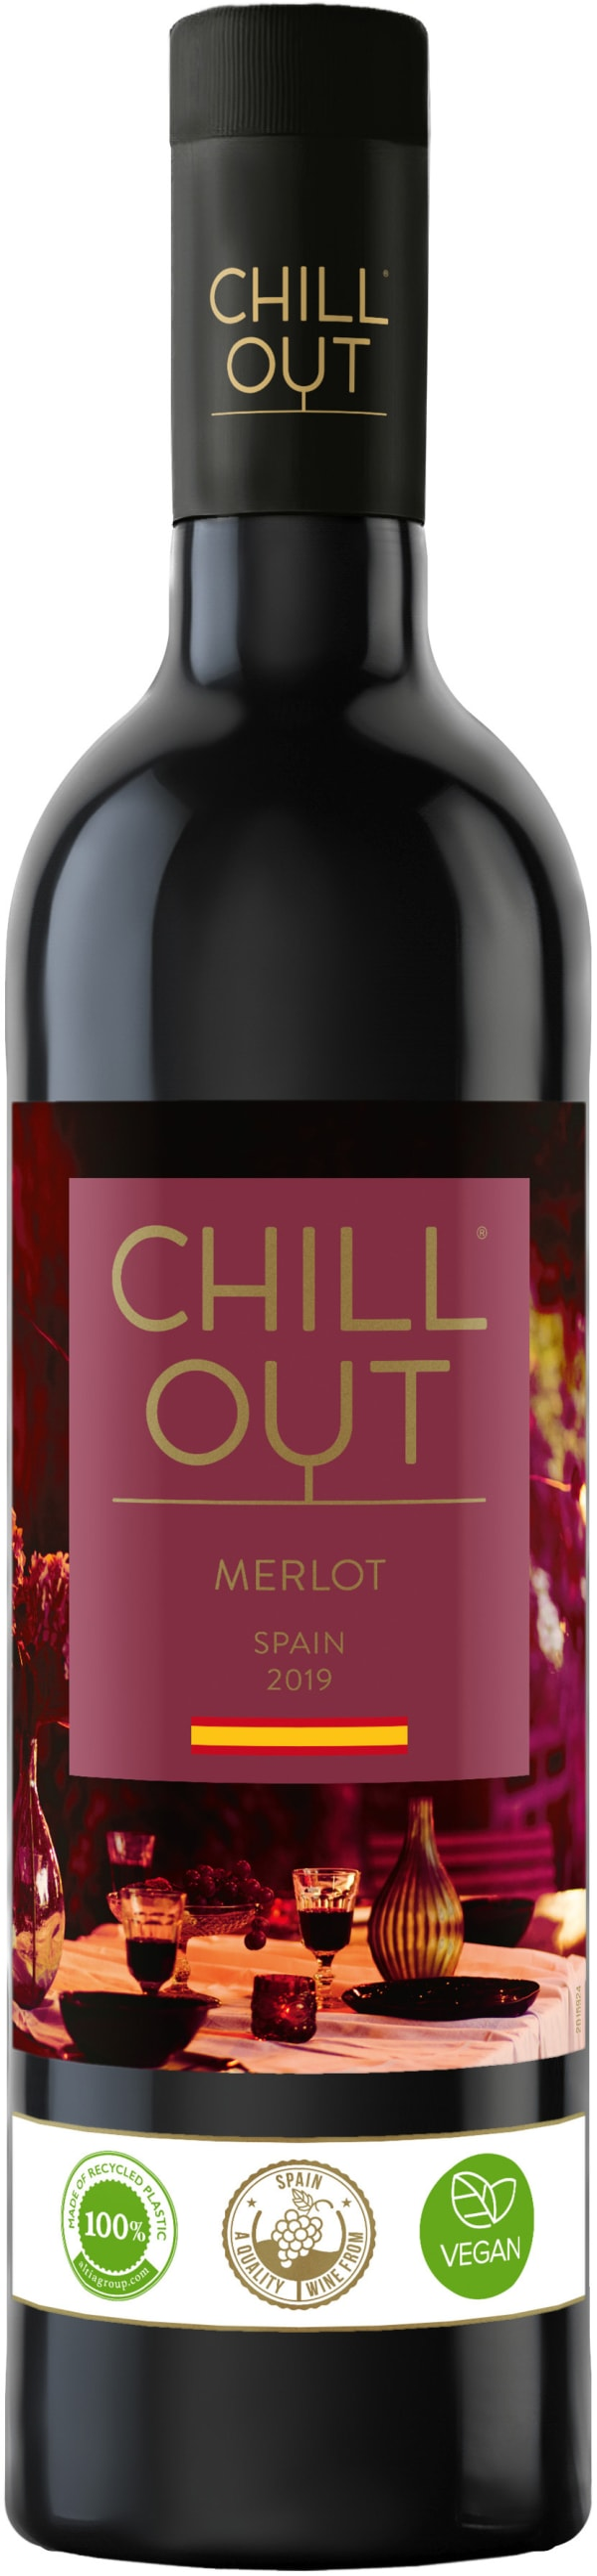 Chill Out Merlot Spain  2018 plastflaska